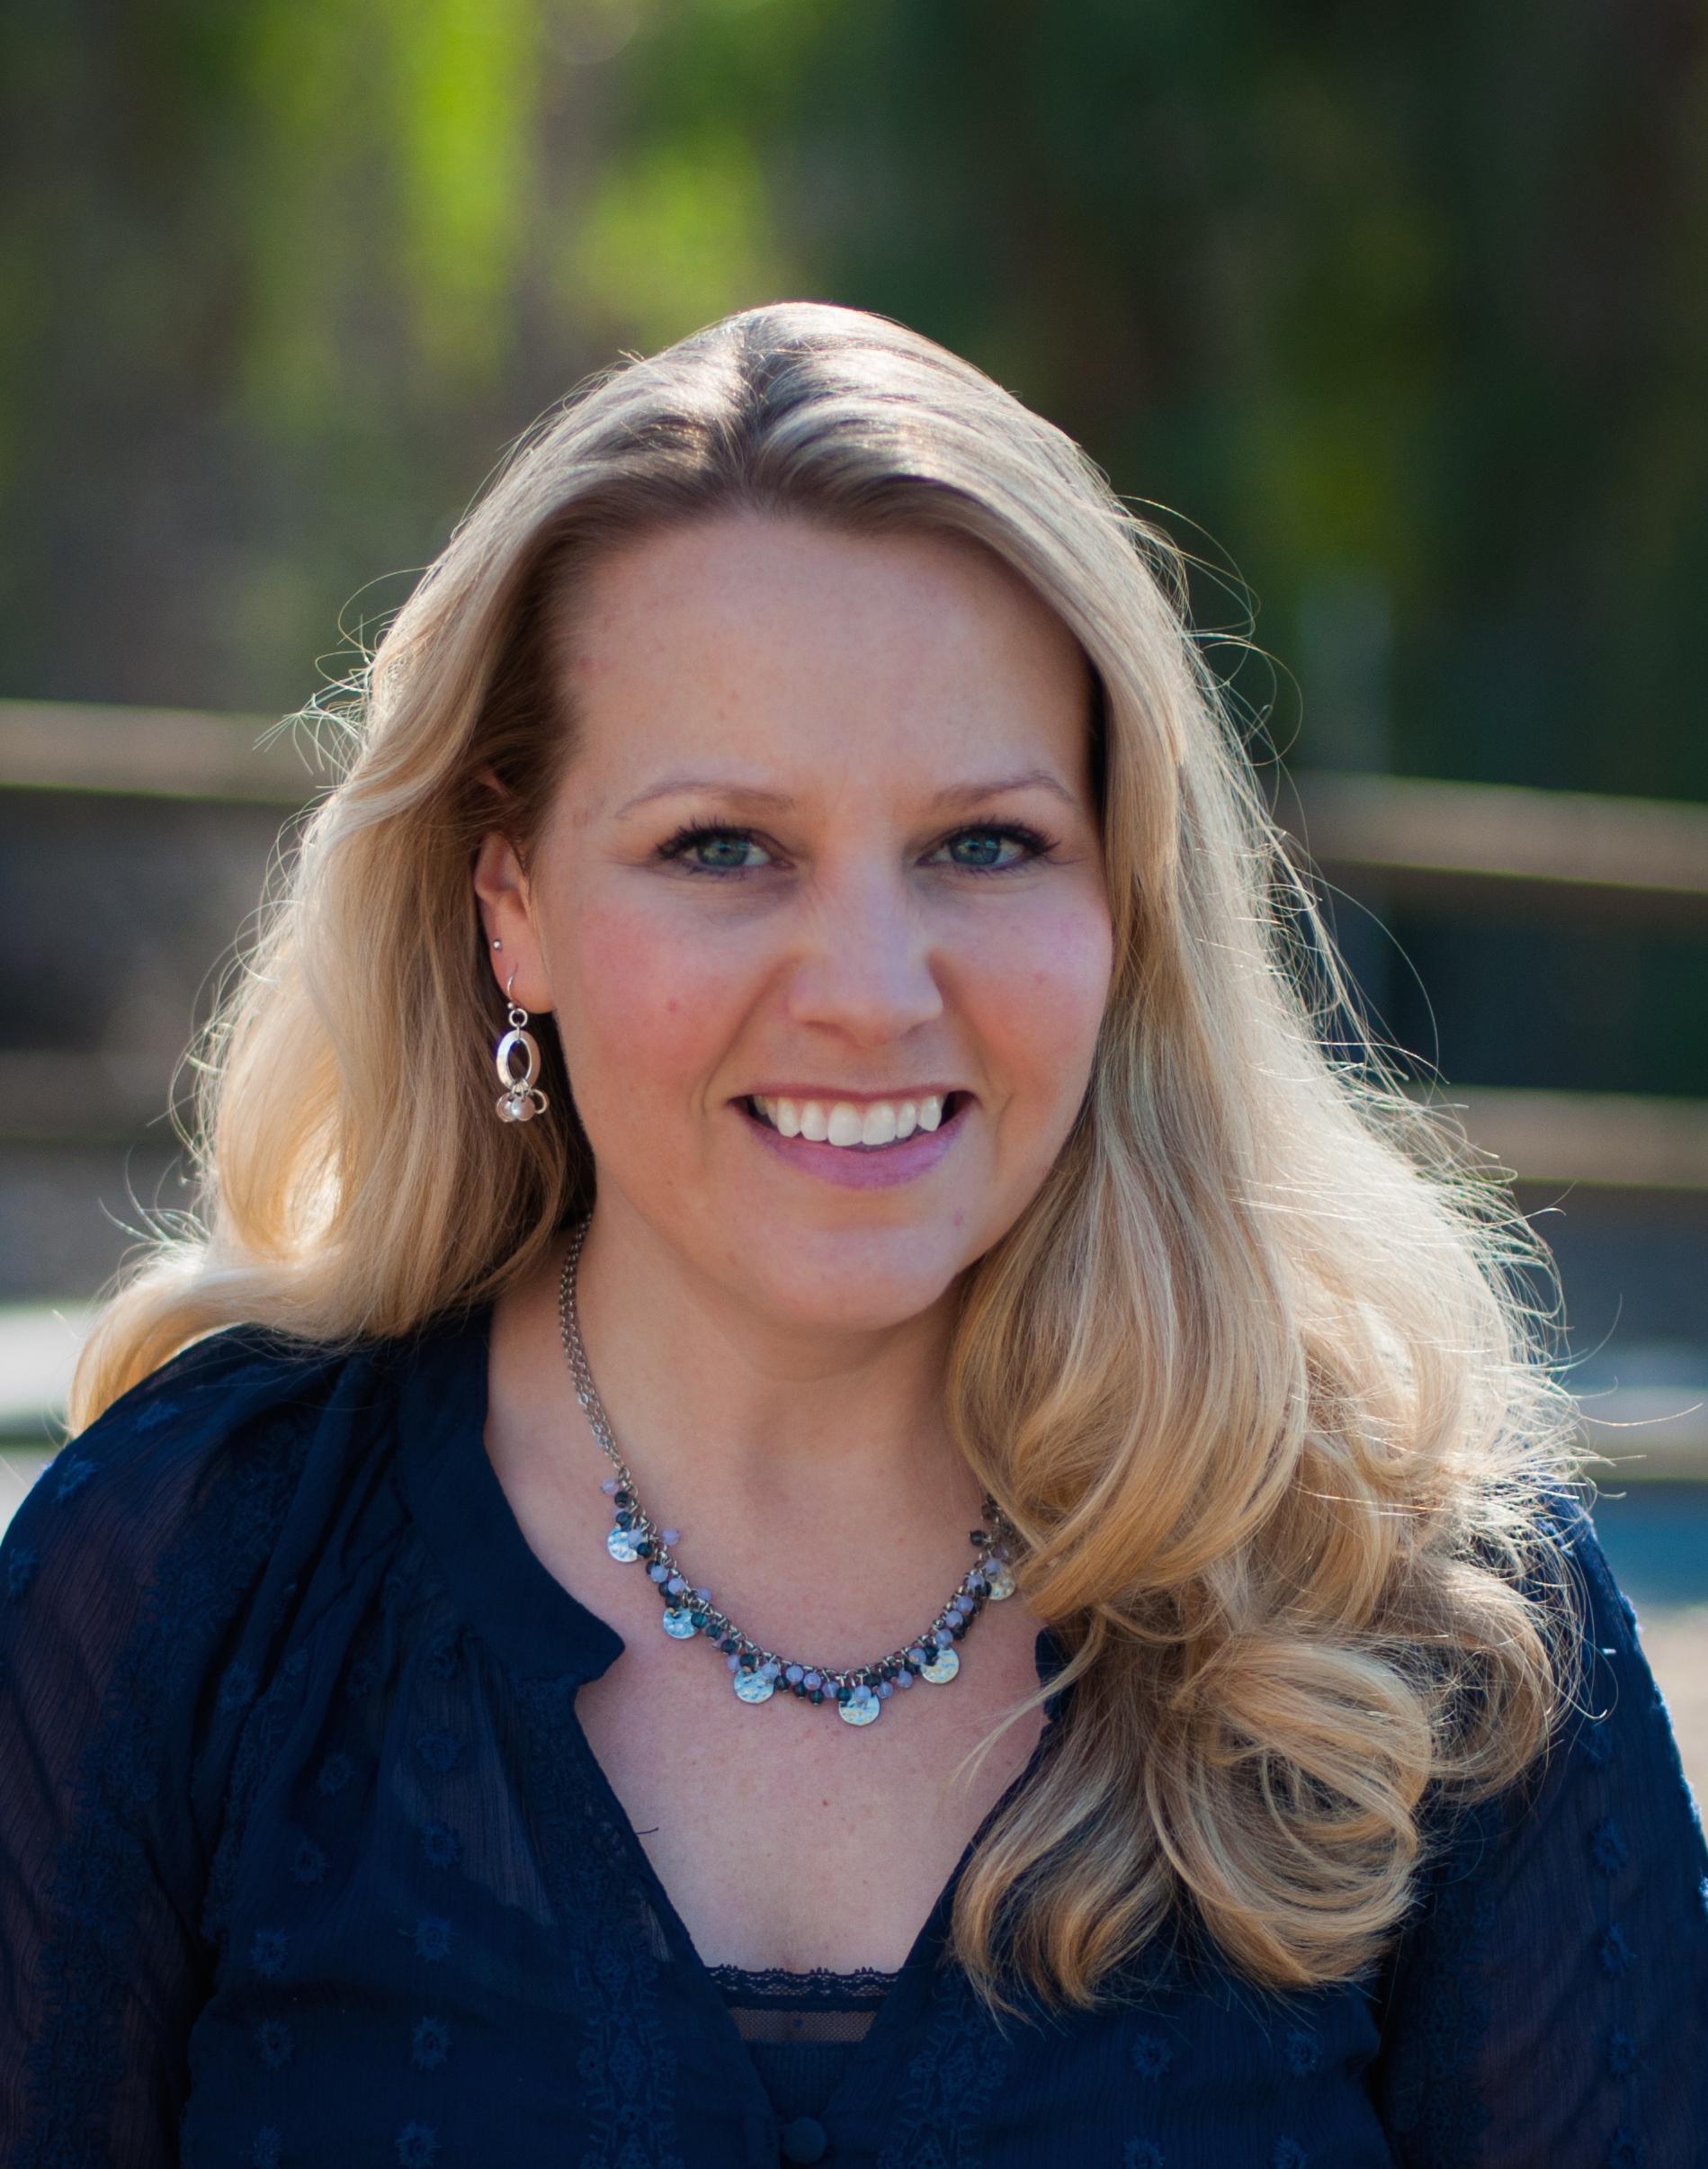 Blog | babystepstowriting | Becoming a better writer one